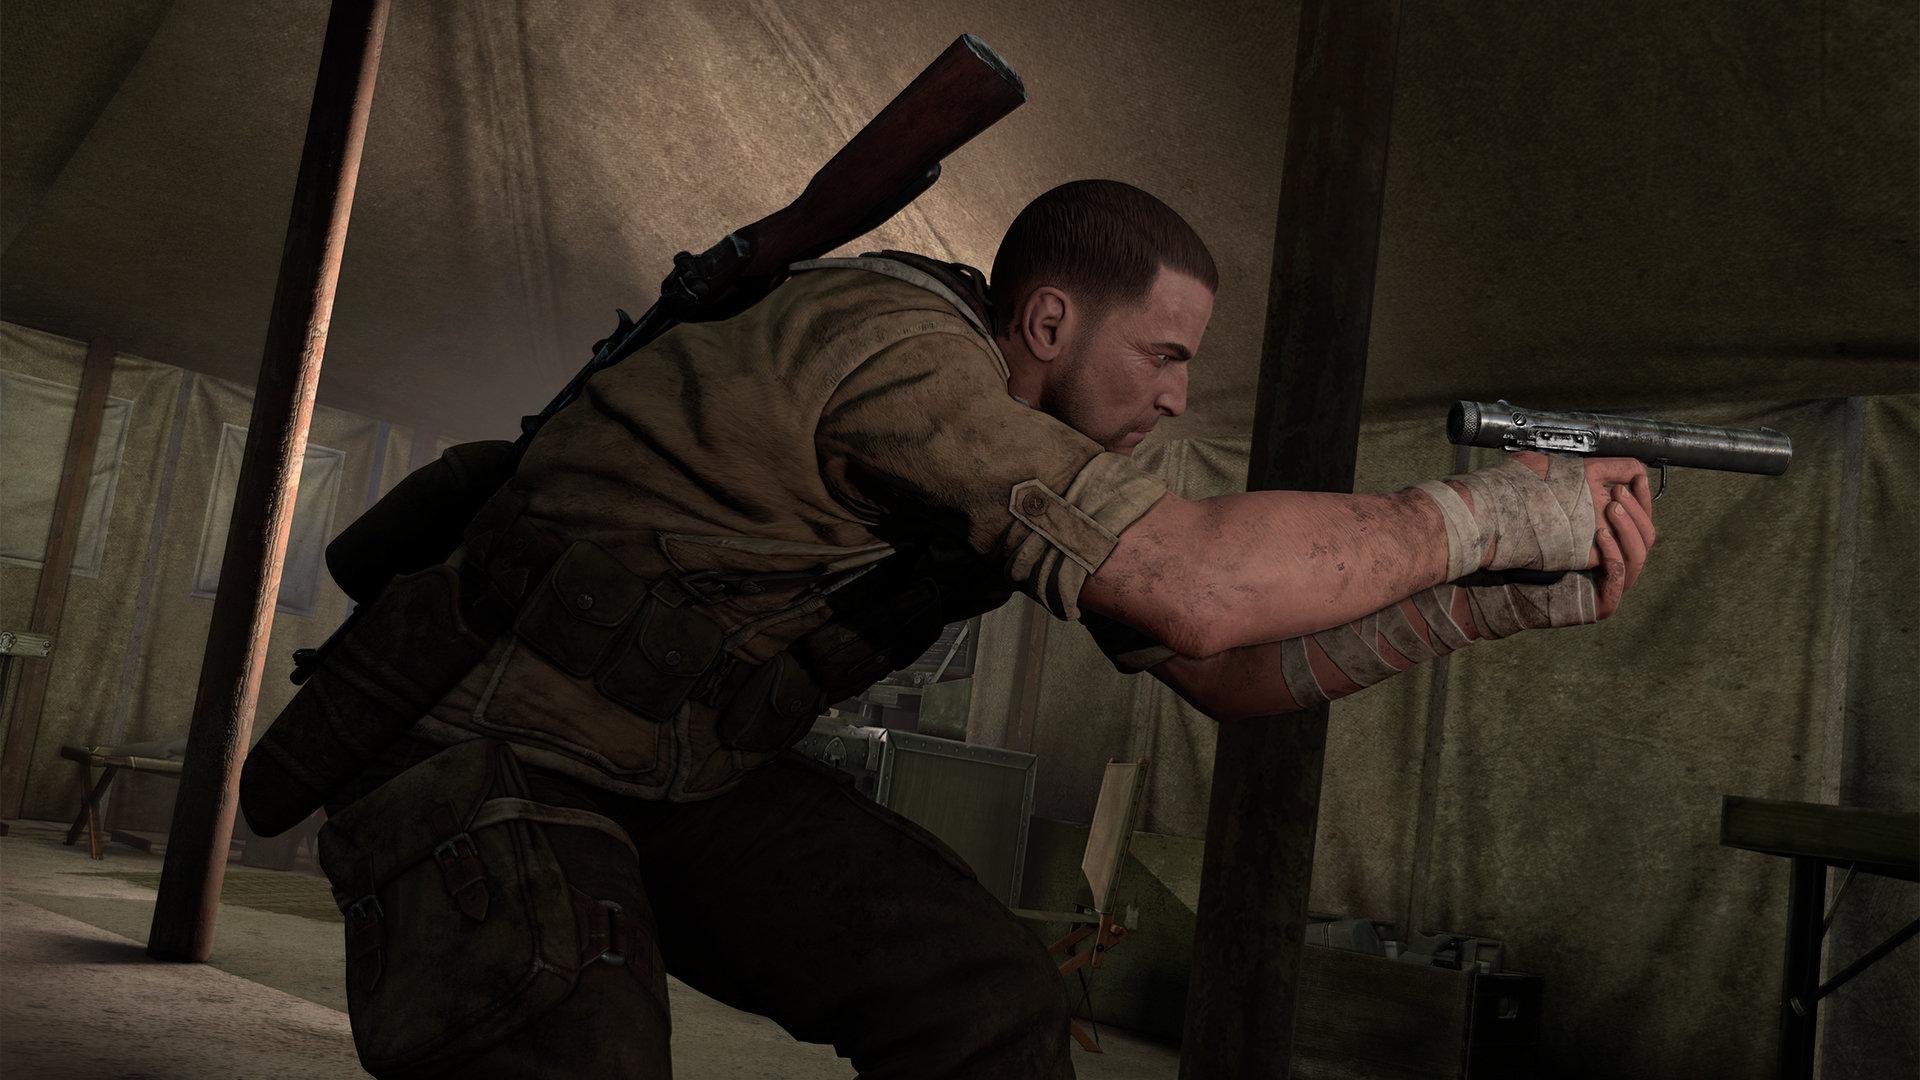 sniper-elite-3-screenshot-07-ps4-us-12ju